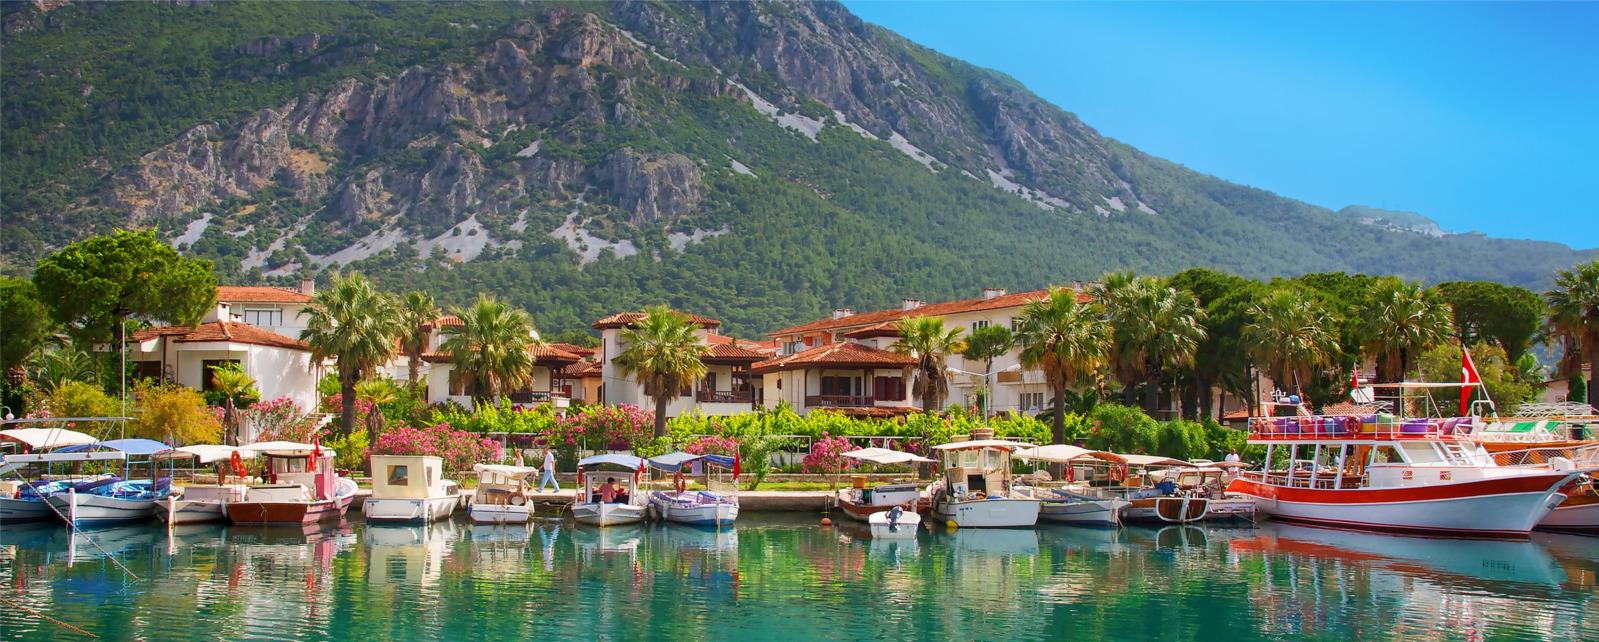 Фото курорта Мармарис. Турция.